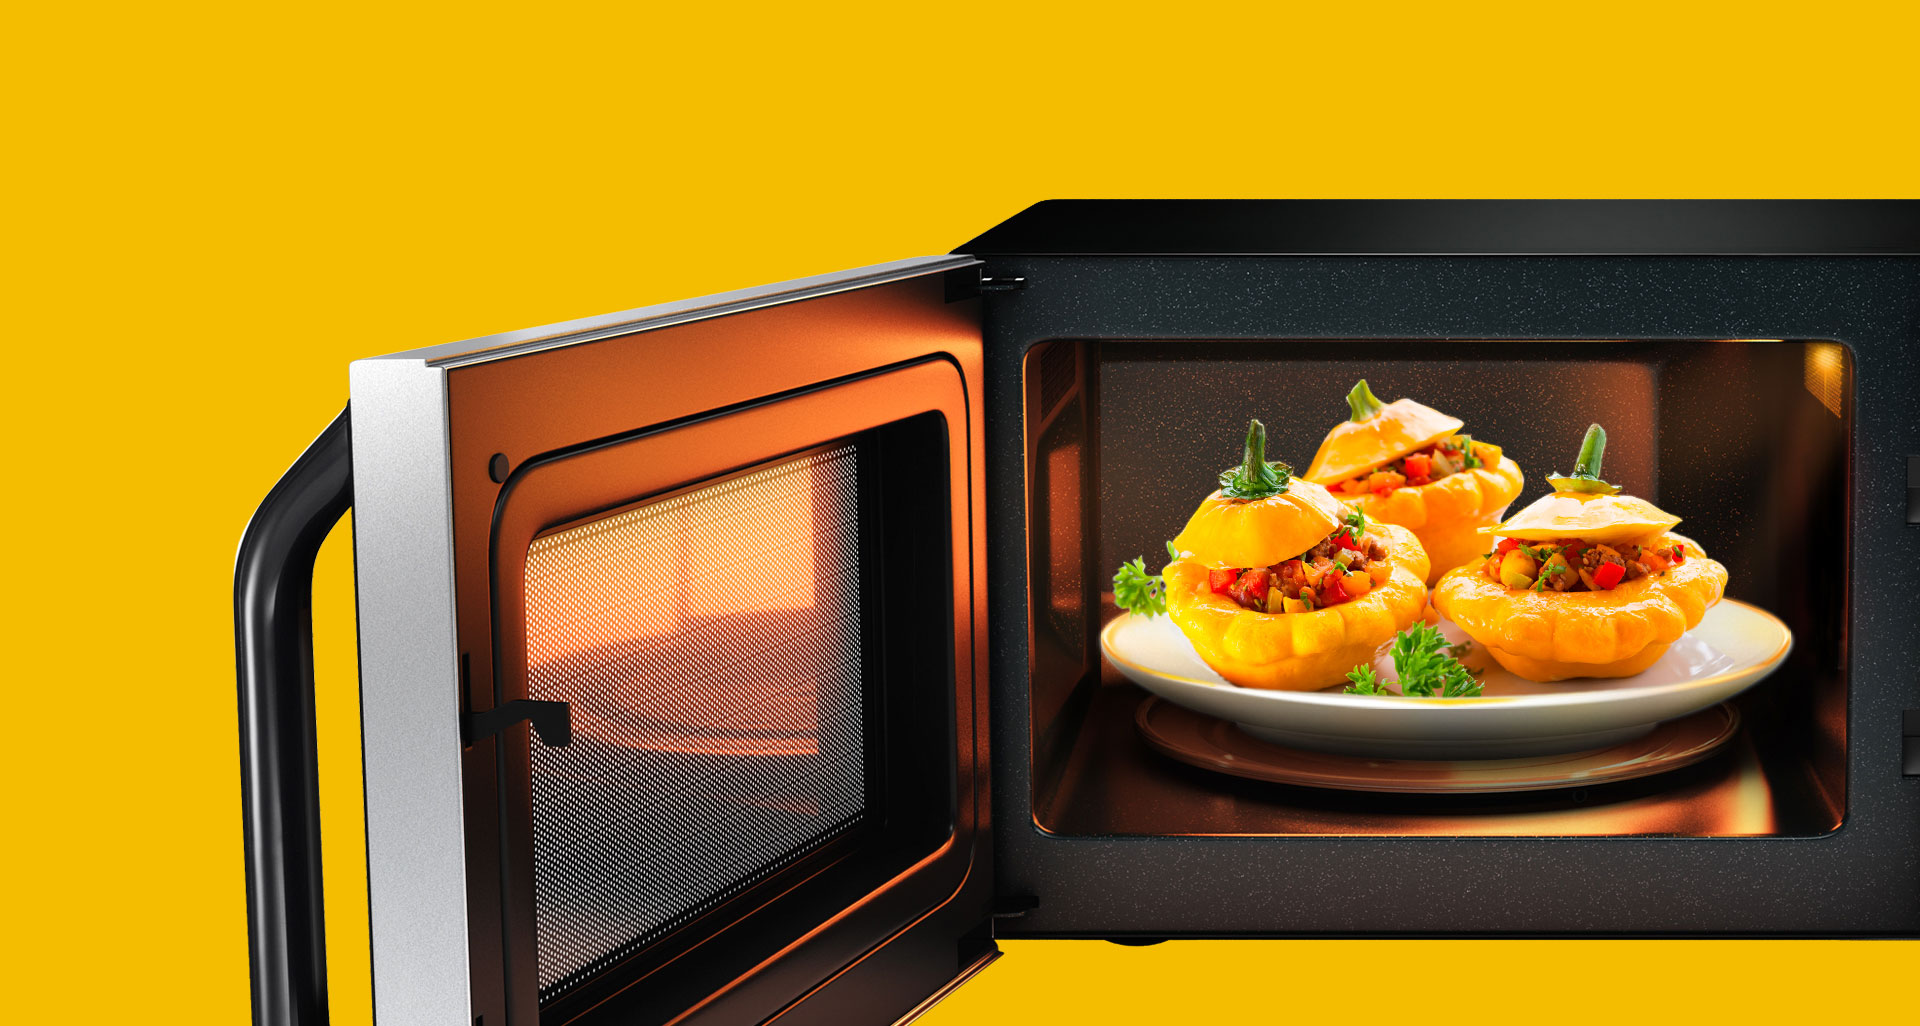 microwave_5_lepotamiraru